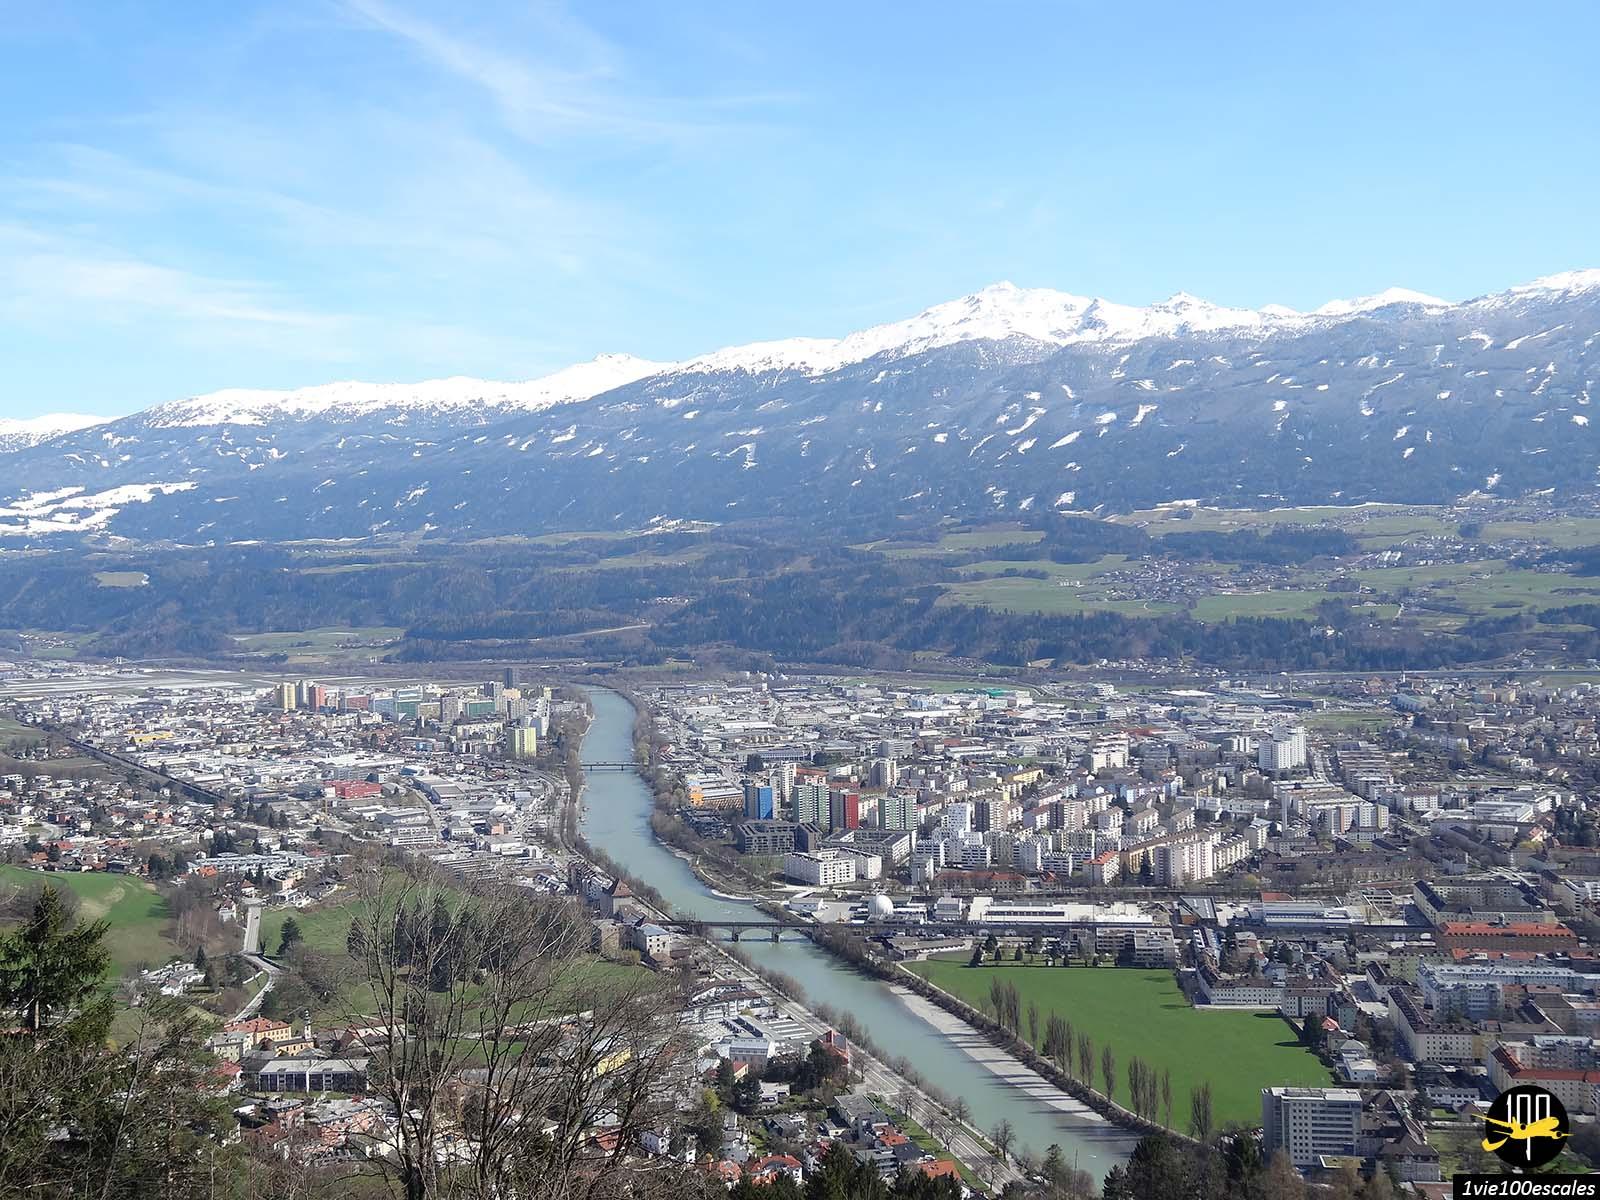 Escale #077 Innsbruck